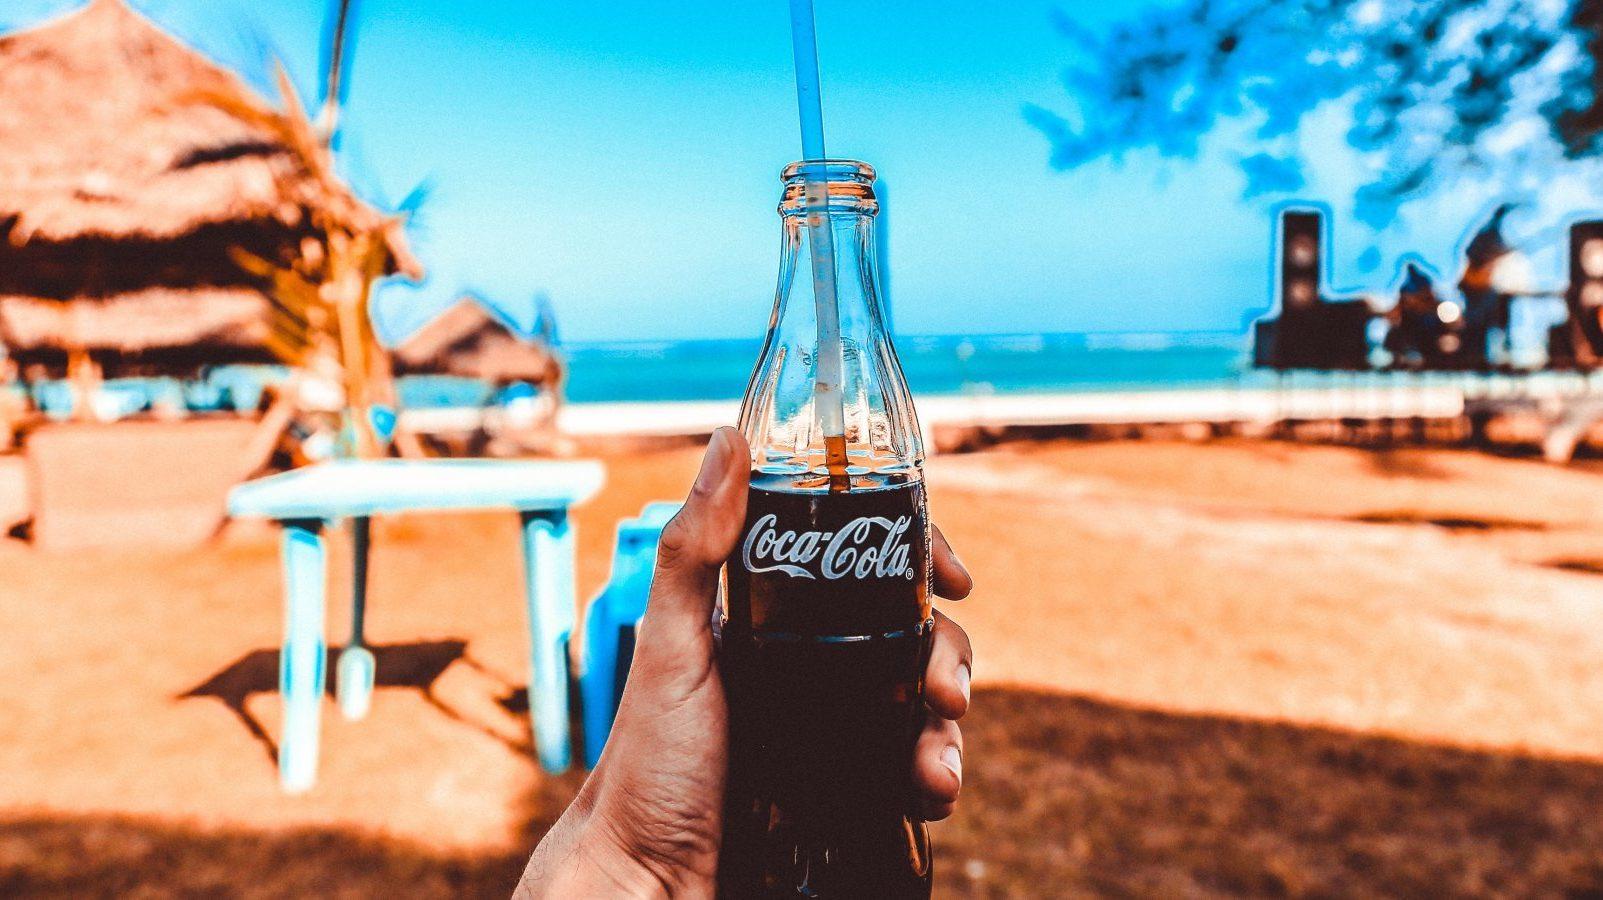 Coca Cola: Από κλειδωμένη συνταγή σε θυρίδα στα 2 δις. προϊόντα την ημέρα